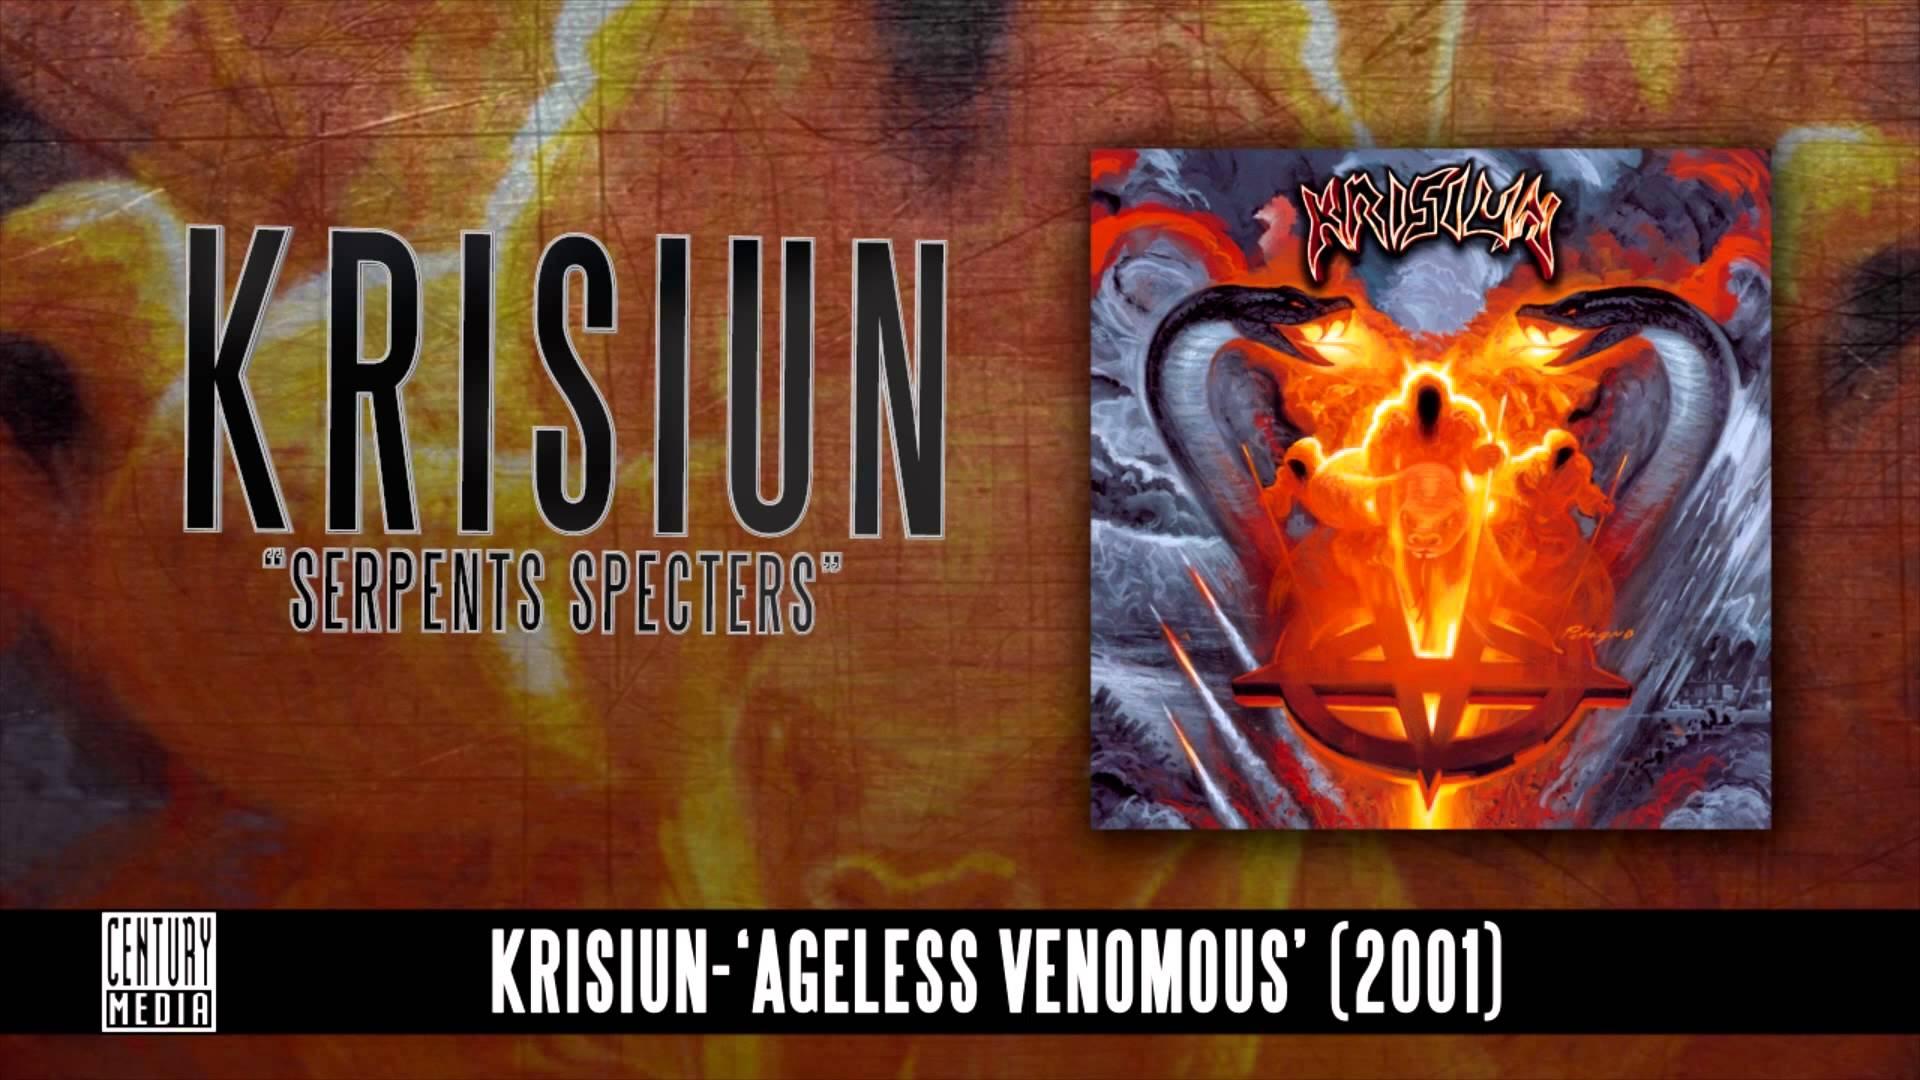 KRISIUN - Serpents Specters (Album Track)